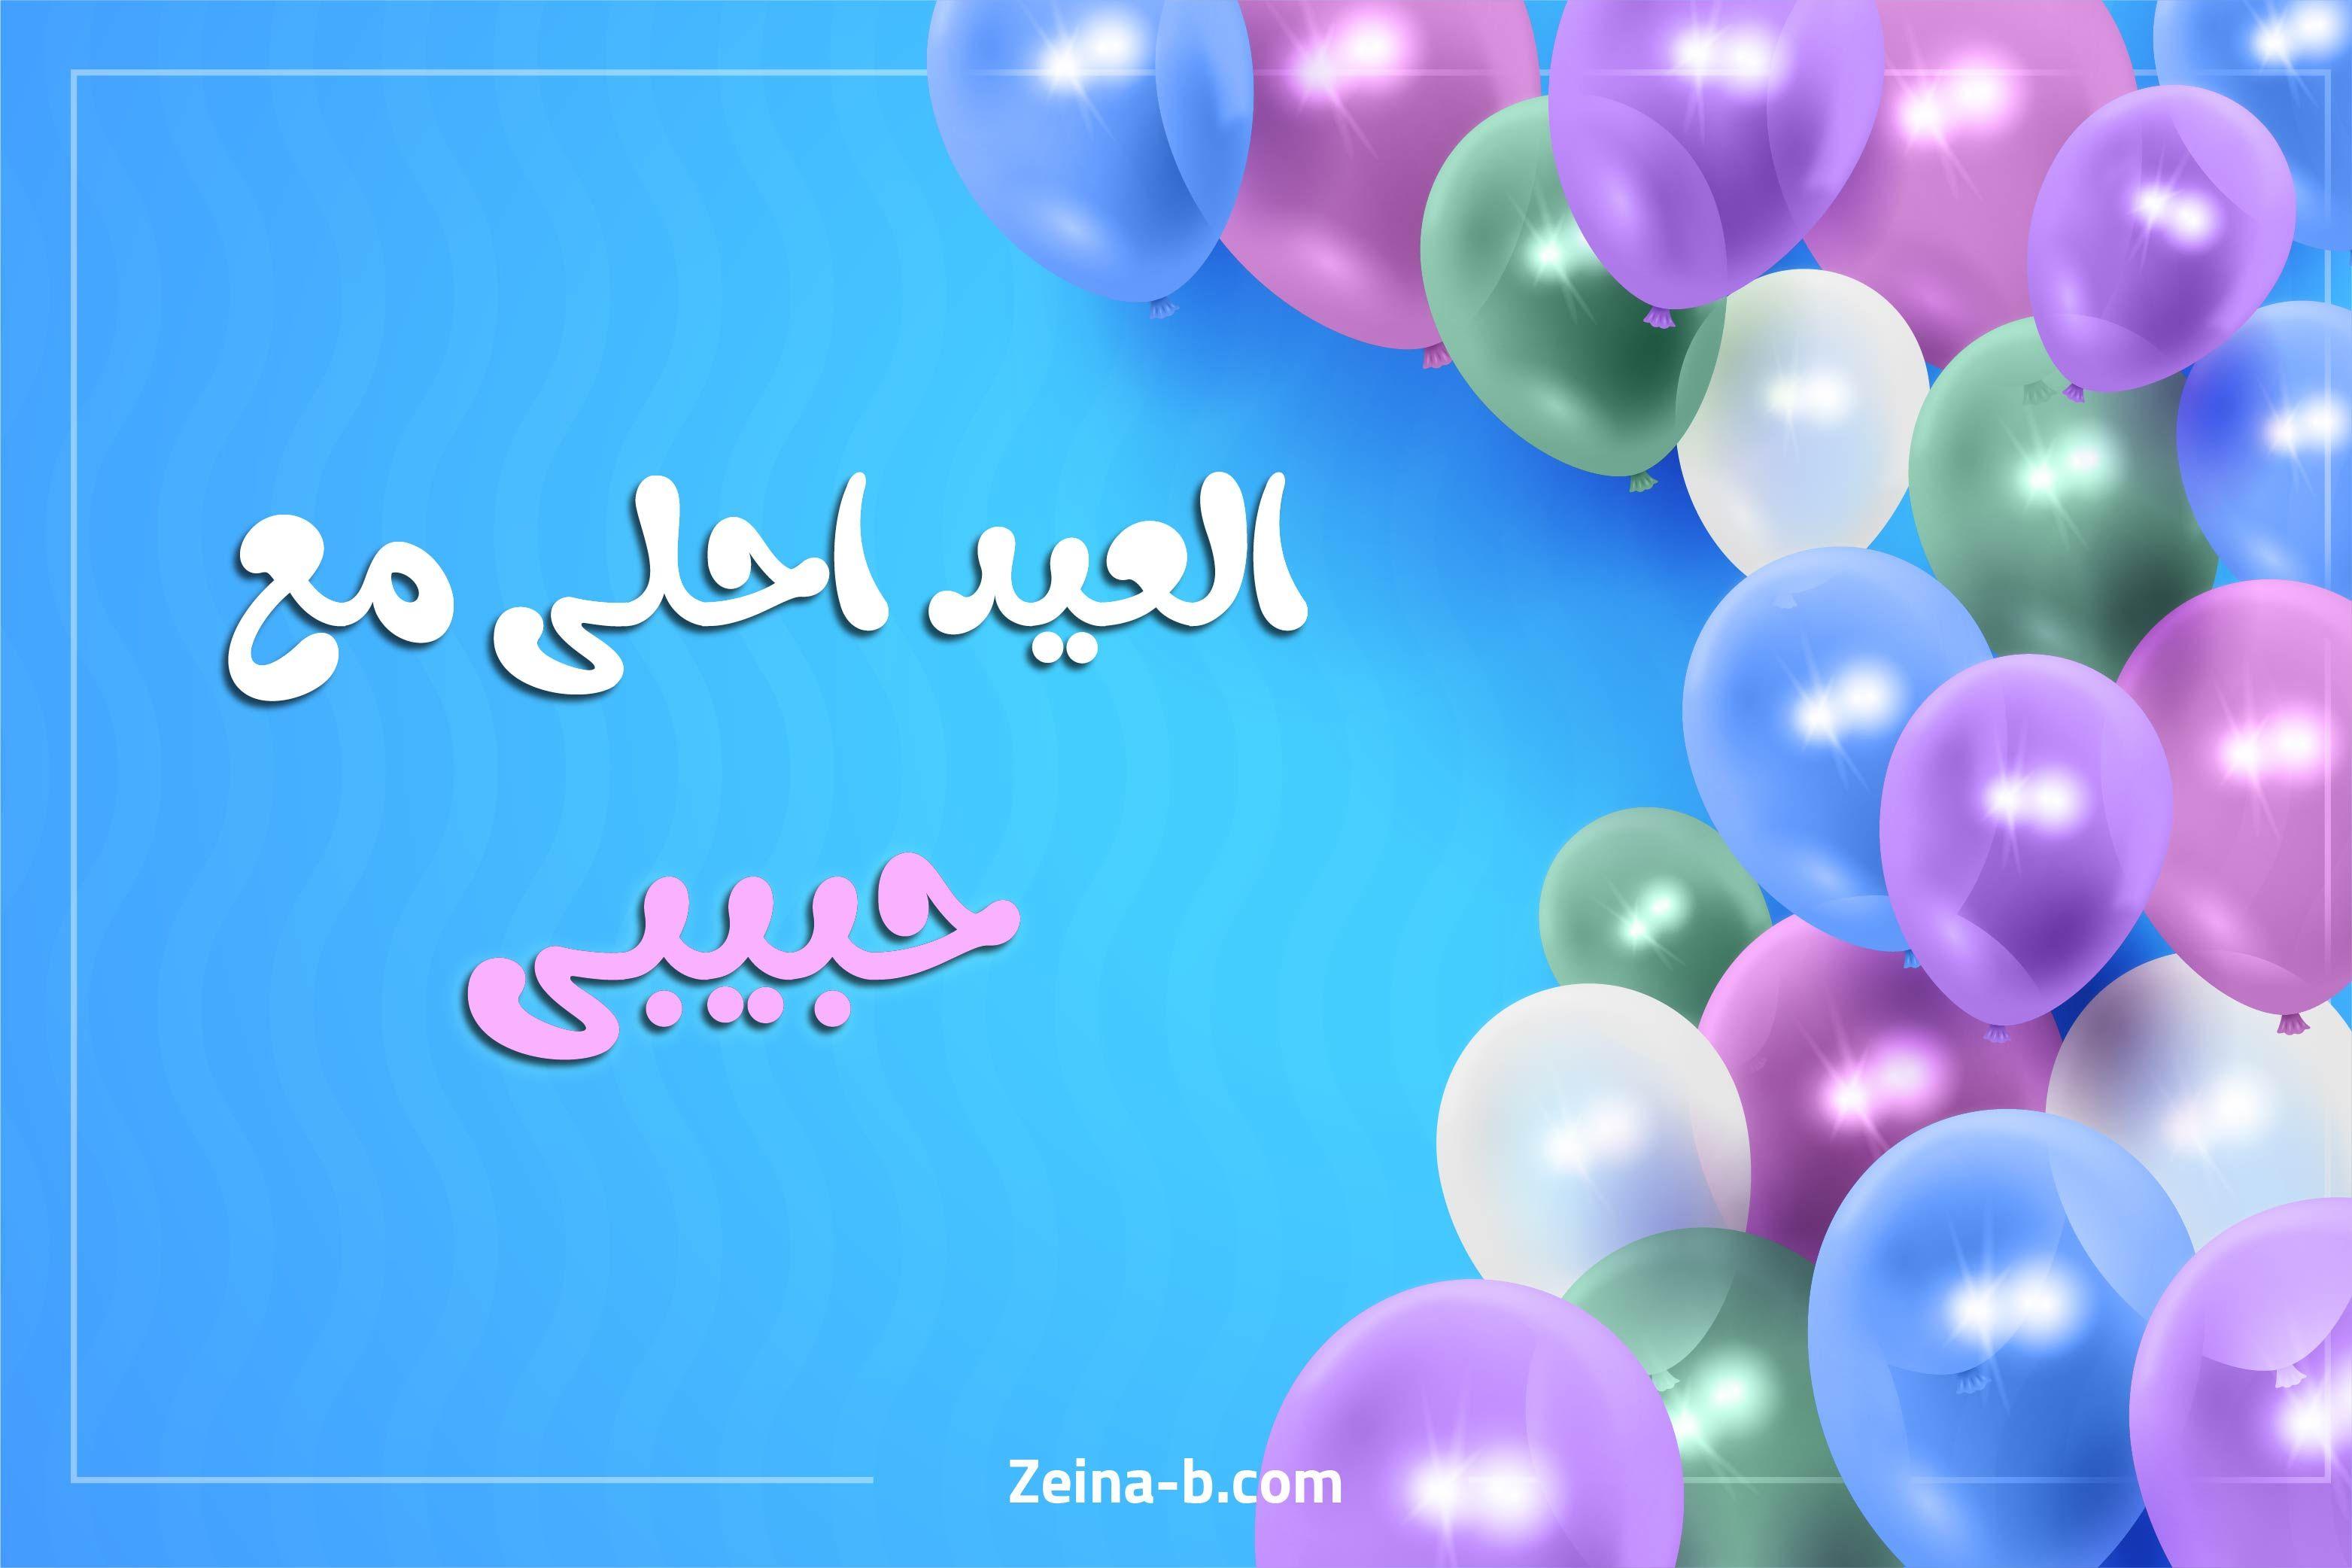 العيد احلي مع حبيبي Happy Eid Neon Signs Live Lokai Bracelet